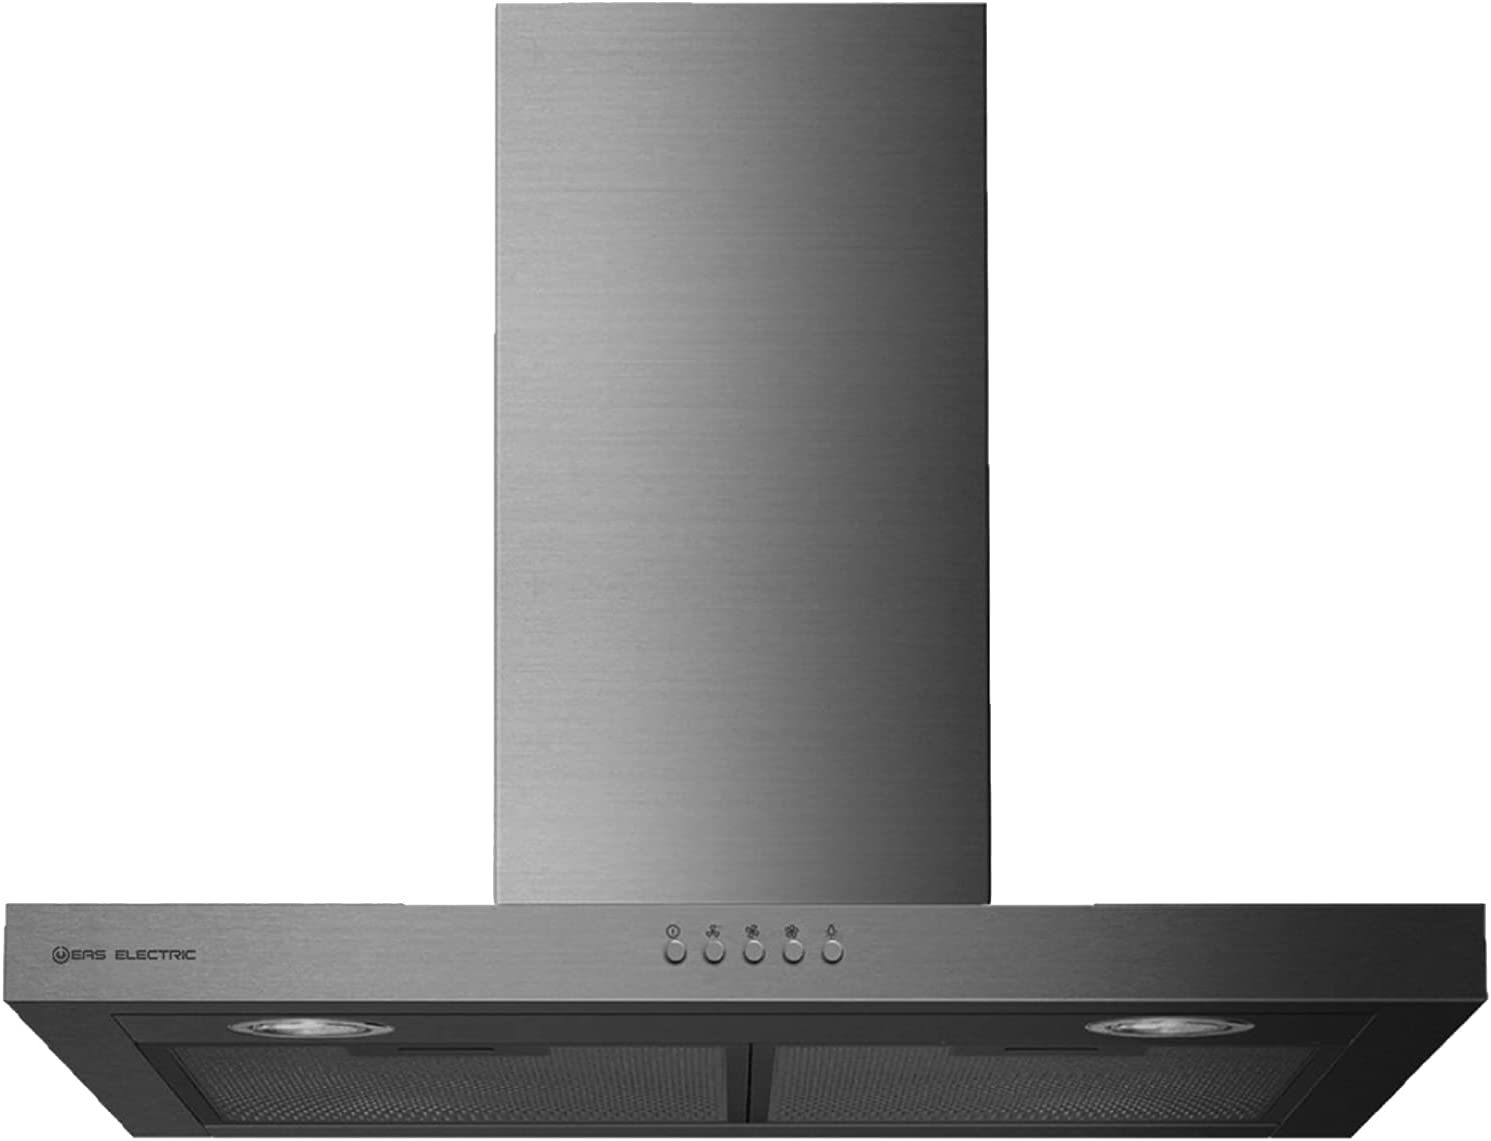 EAS ELECTRIC SMART TECHNOLOGY | EMRH906X | Campana extractora | Campana de pared | Anchura de 90 cm | Color Inox | Control Mecánico | 3 niveles | LED | 3 filtros lavables | capacidad de 600 m3/h